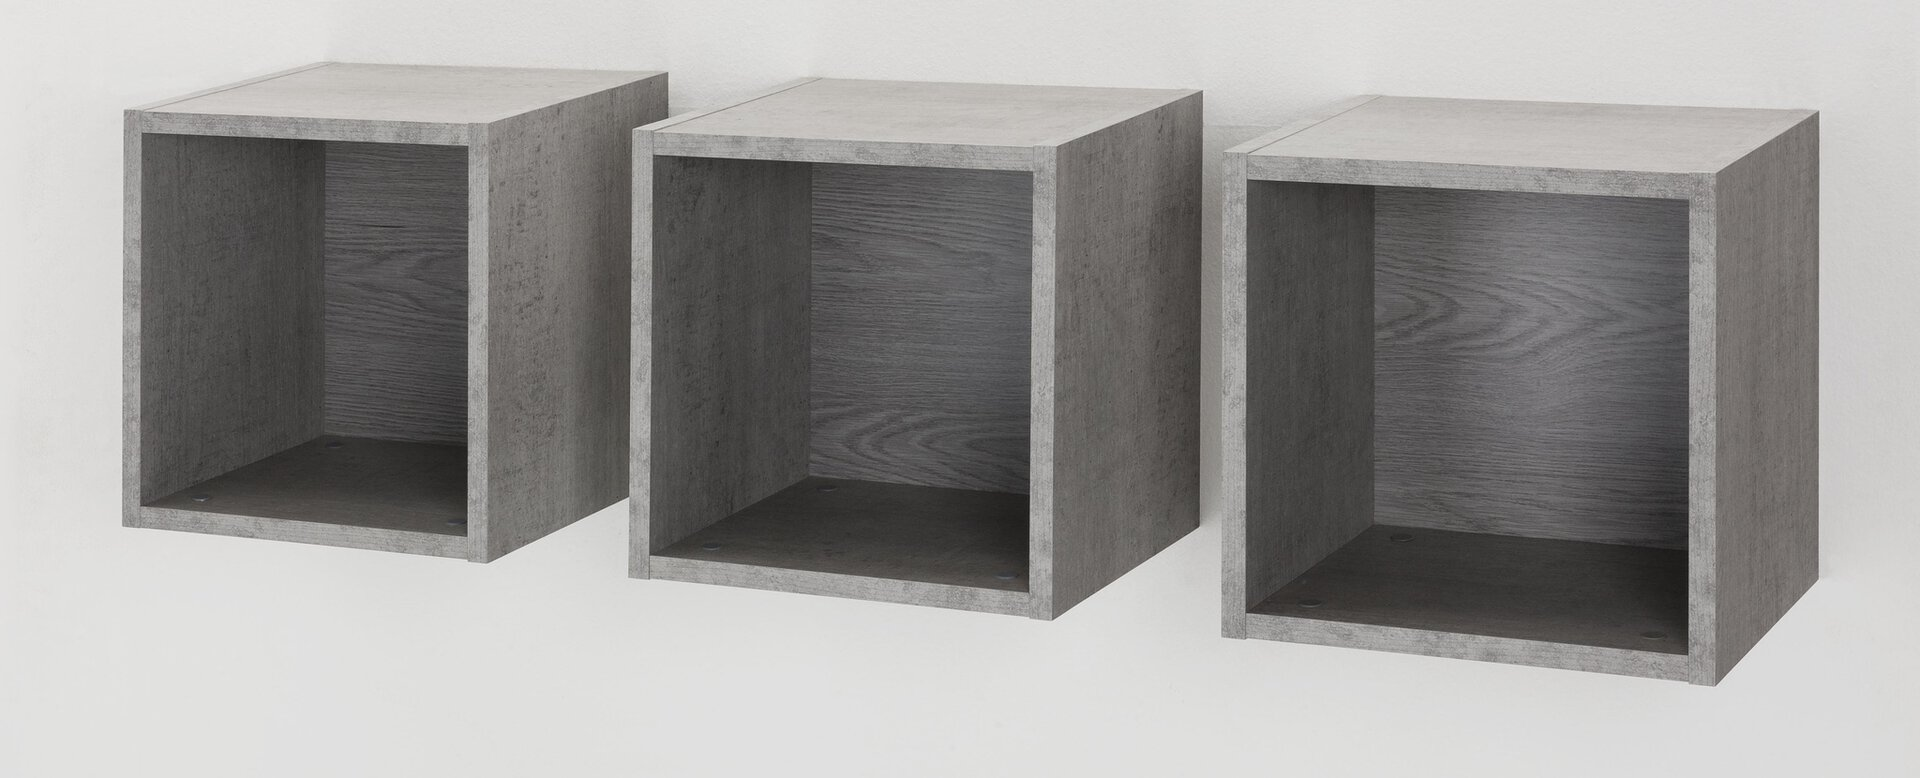 Zubehör MODELLO inbuy Holzwerkstoff grau 28 x 35 x 35 cm